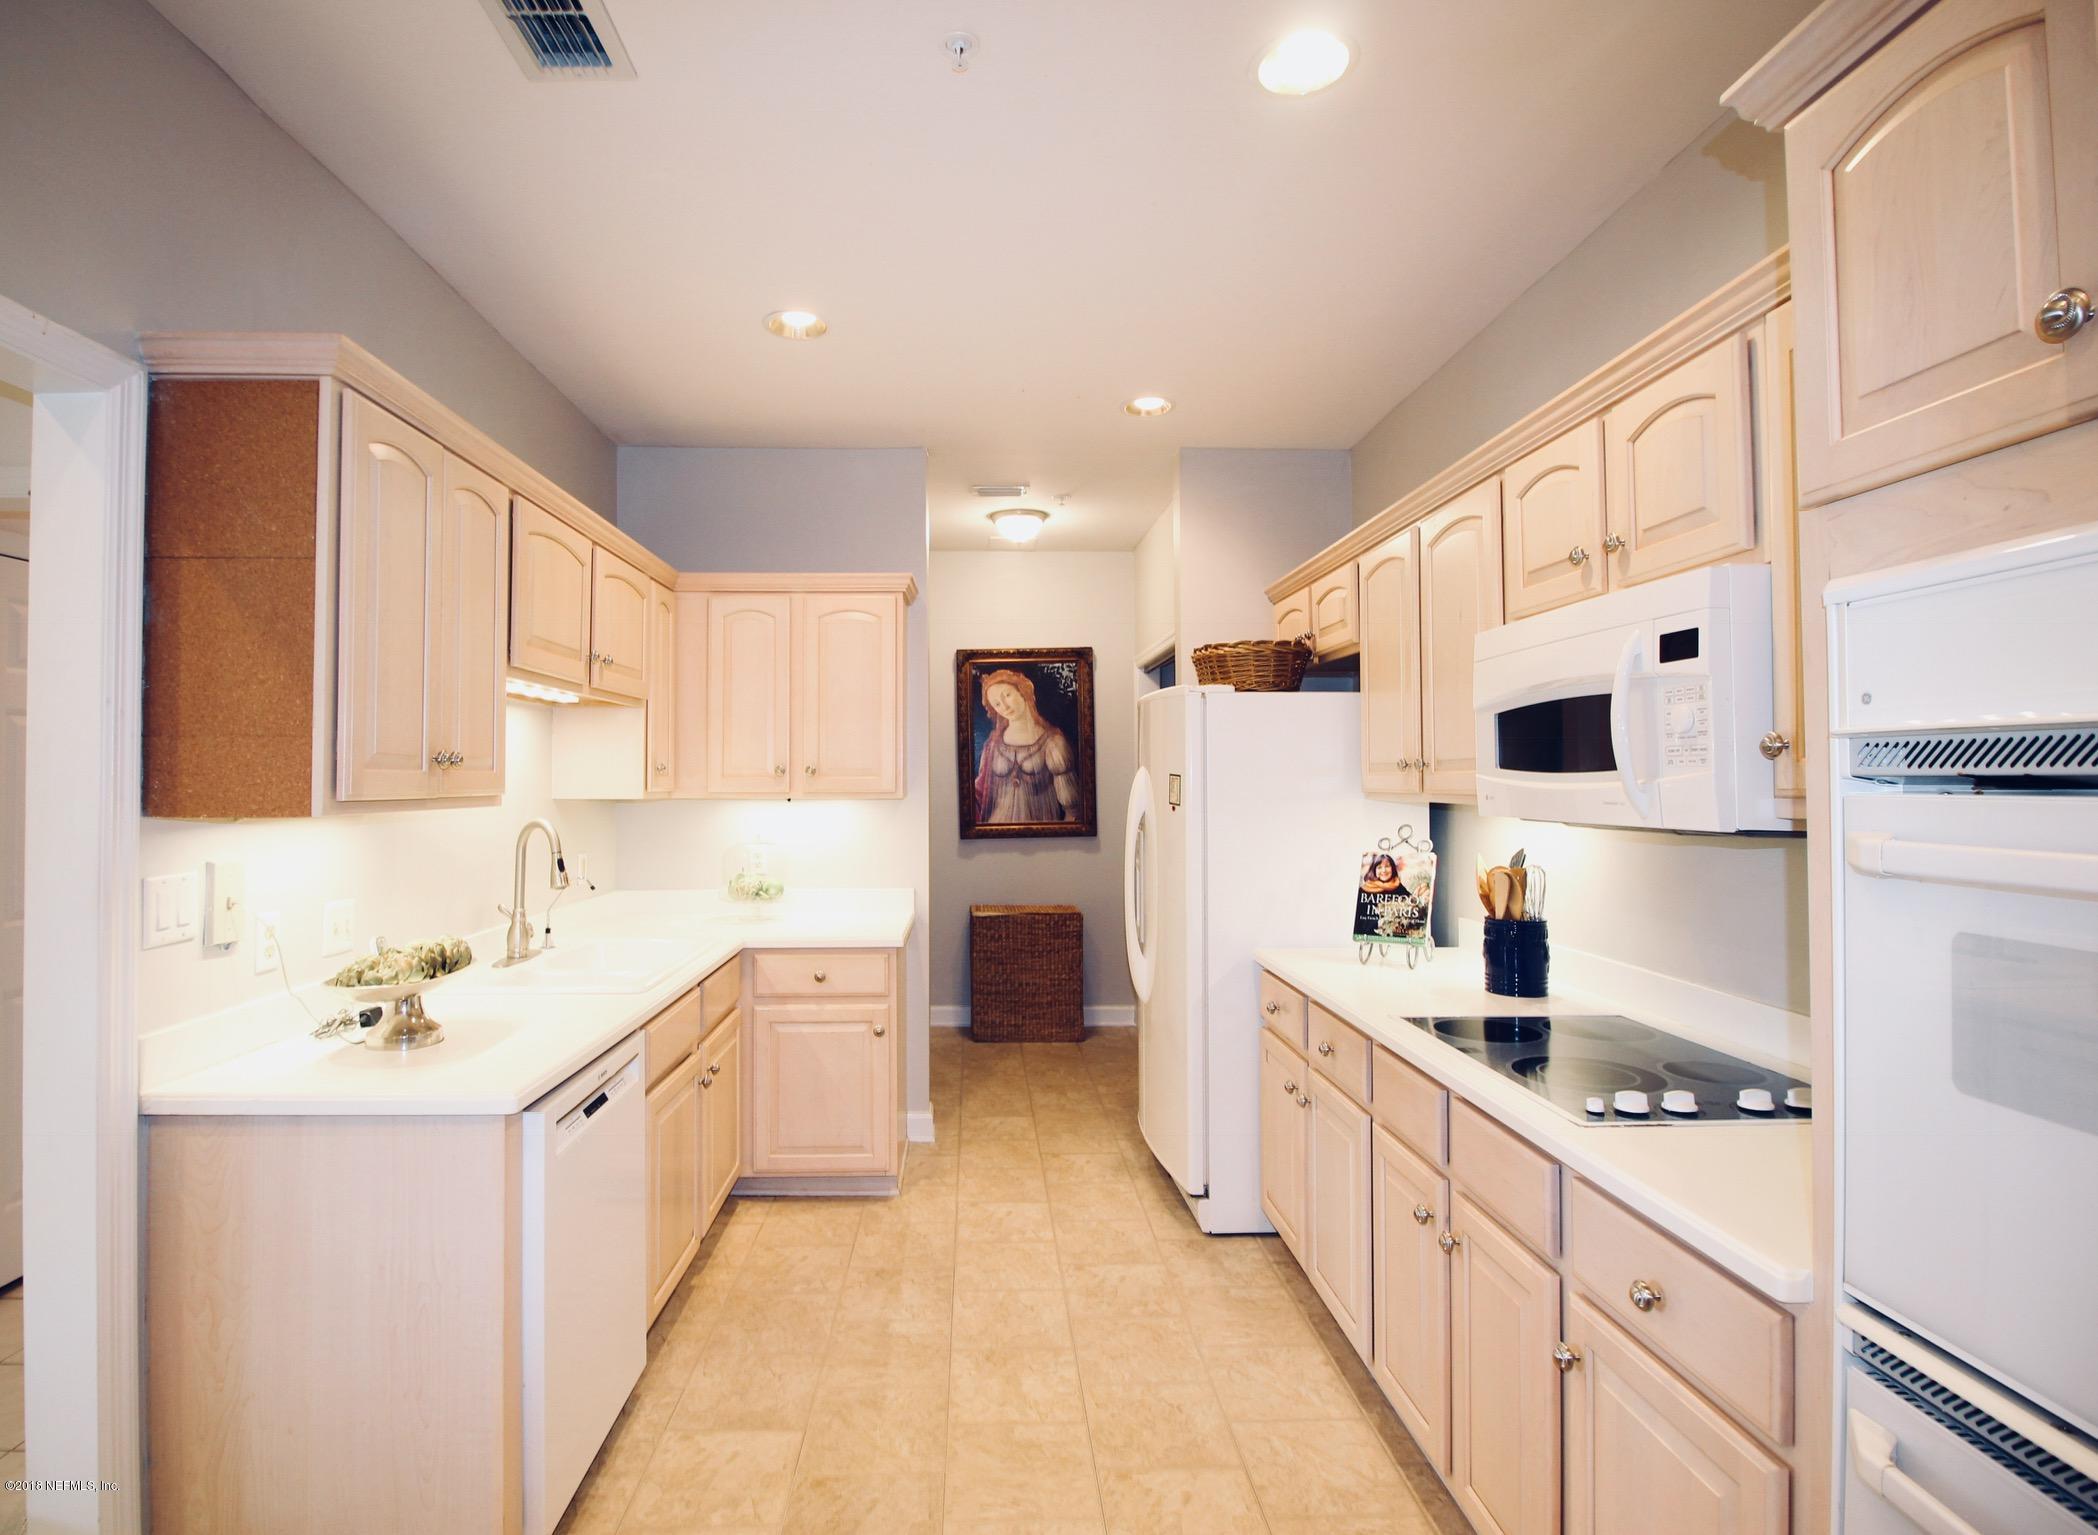 600 PONTE VEDRA, PONTE VEDRA BEACH, FLORIDA 32082, 3 Bedrooms Bedrooms, ,2 BathroomsBathrooms,Residential - condos/townhomes,For sale,PONTE VEDRA,954283